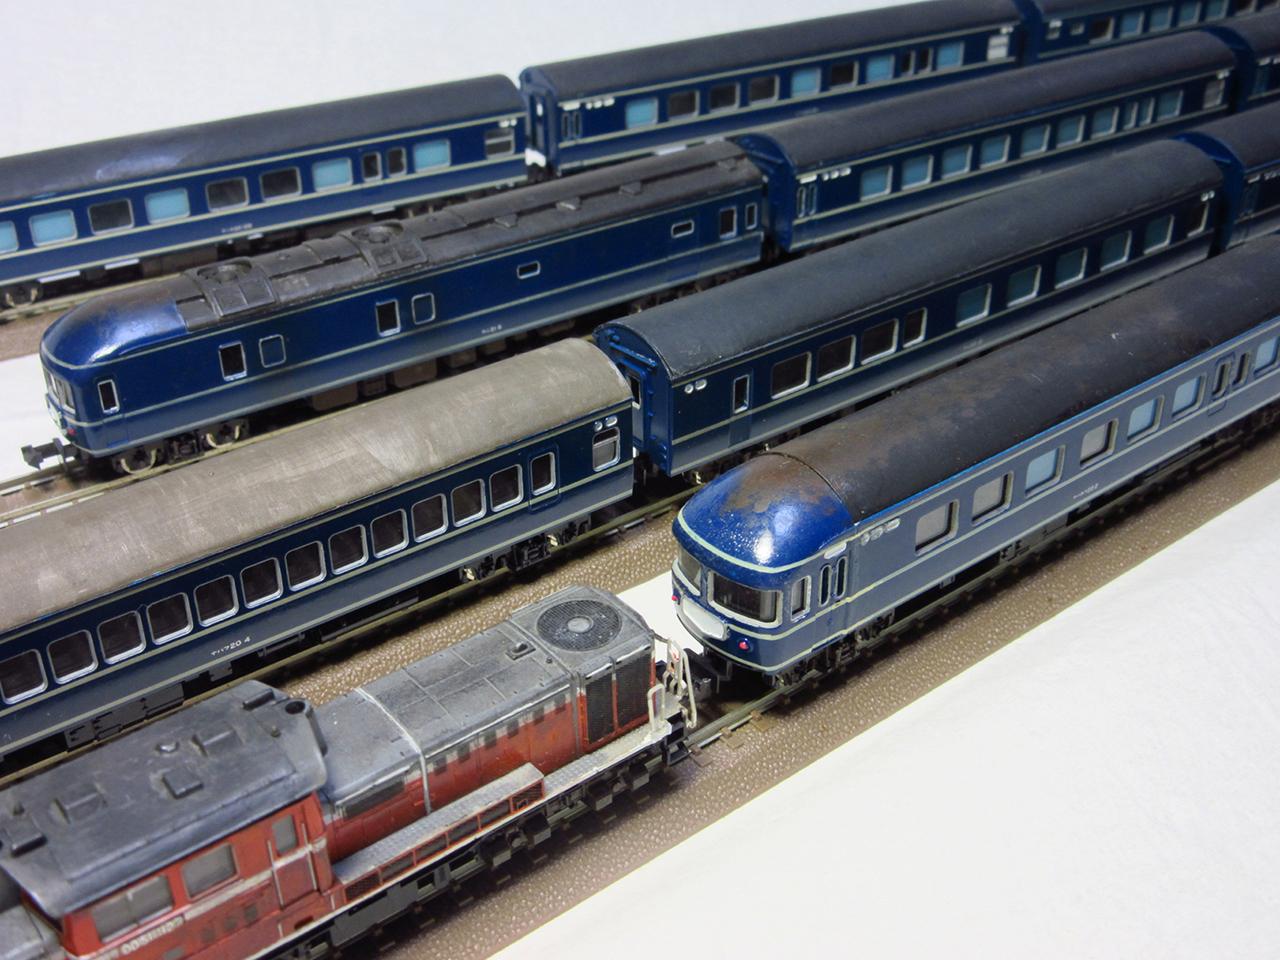 http://moritetsu.info/model-railway/img/20IMG_8358sss.jpg